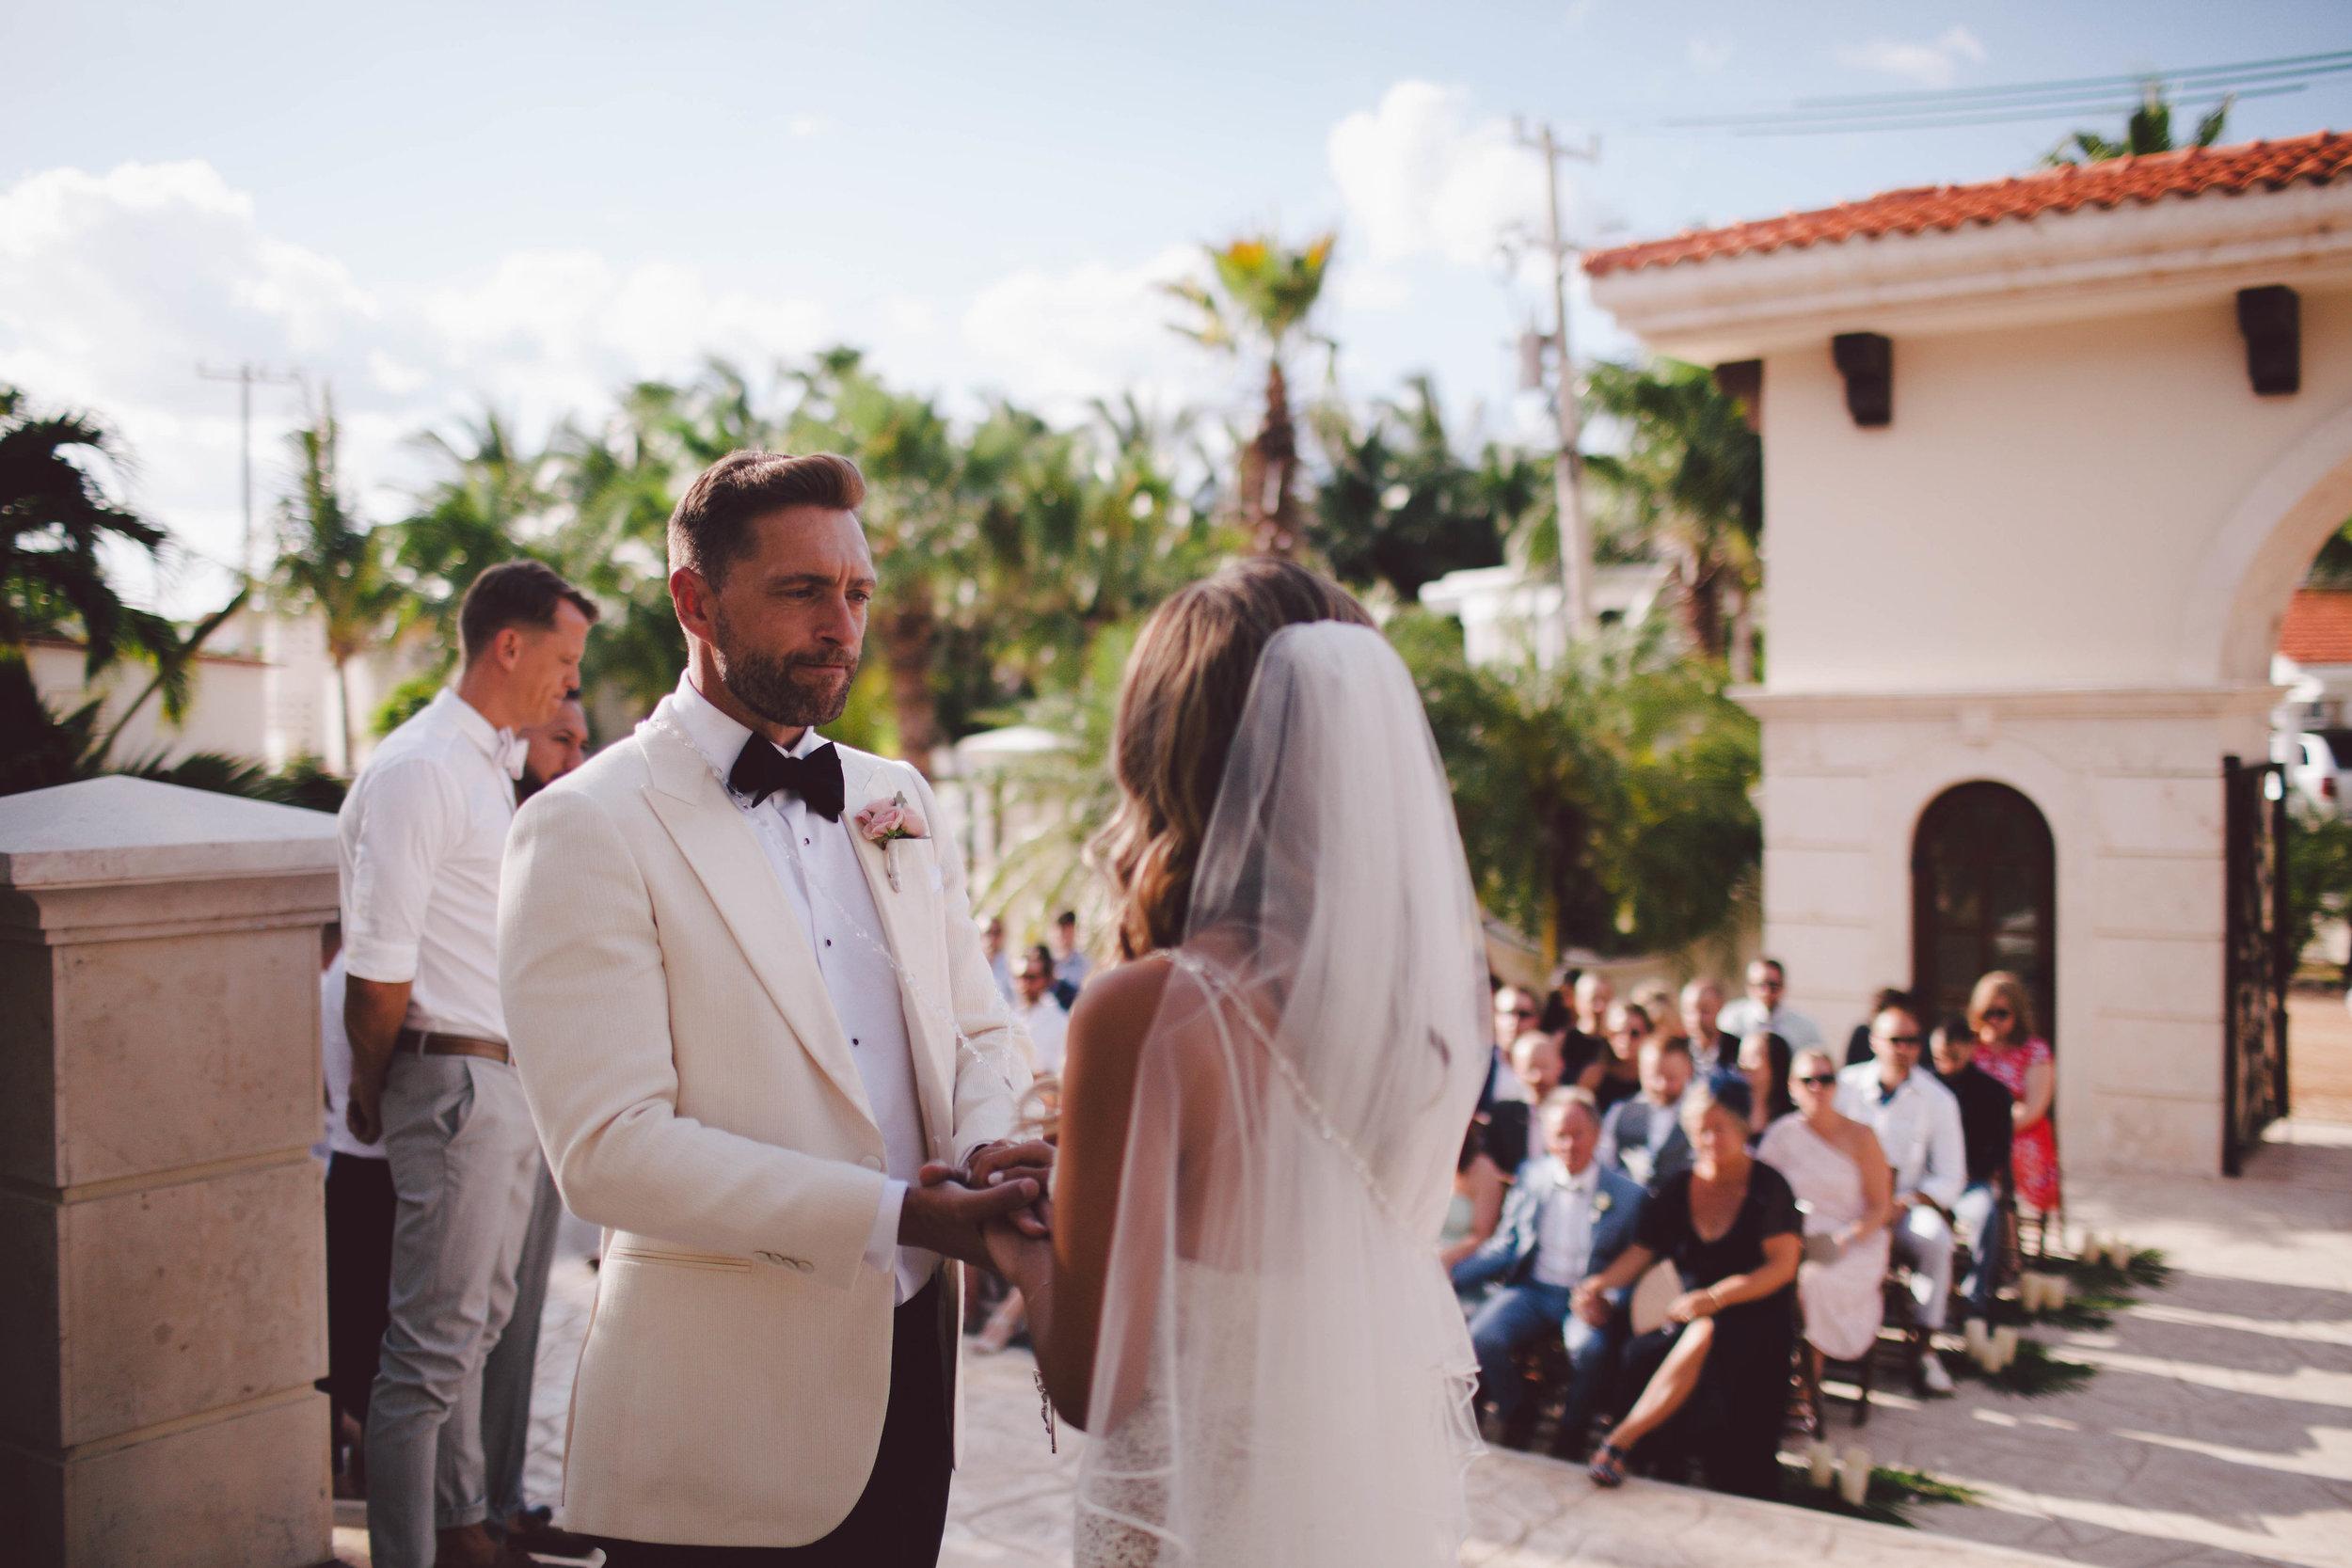 mexico_wedding_cancun_villa_la_joya_evangeline_lane_063.jpg